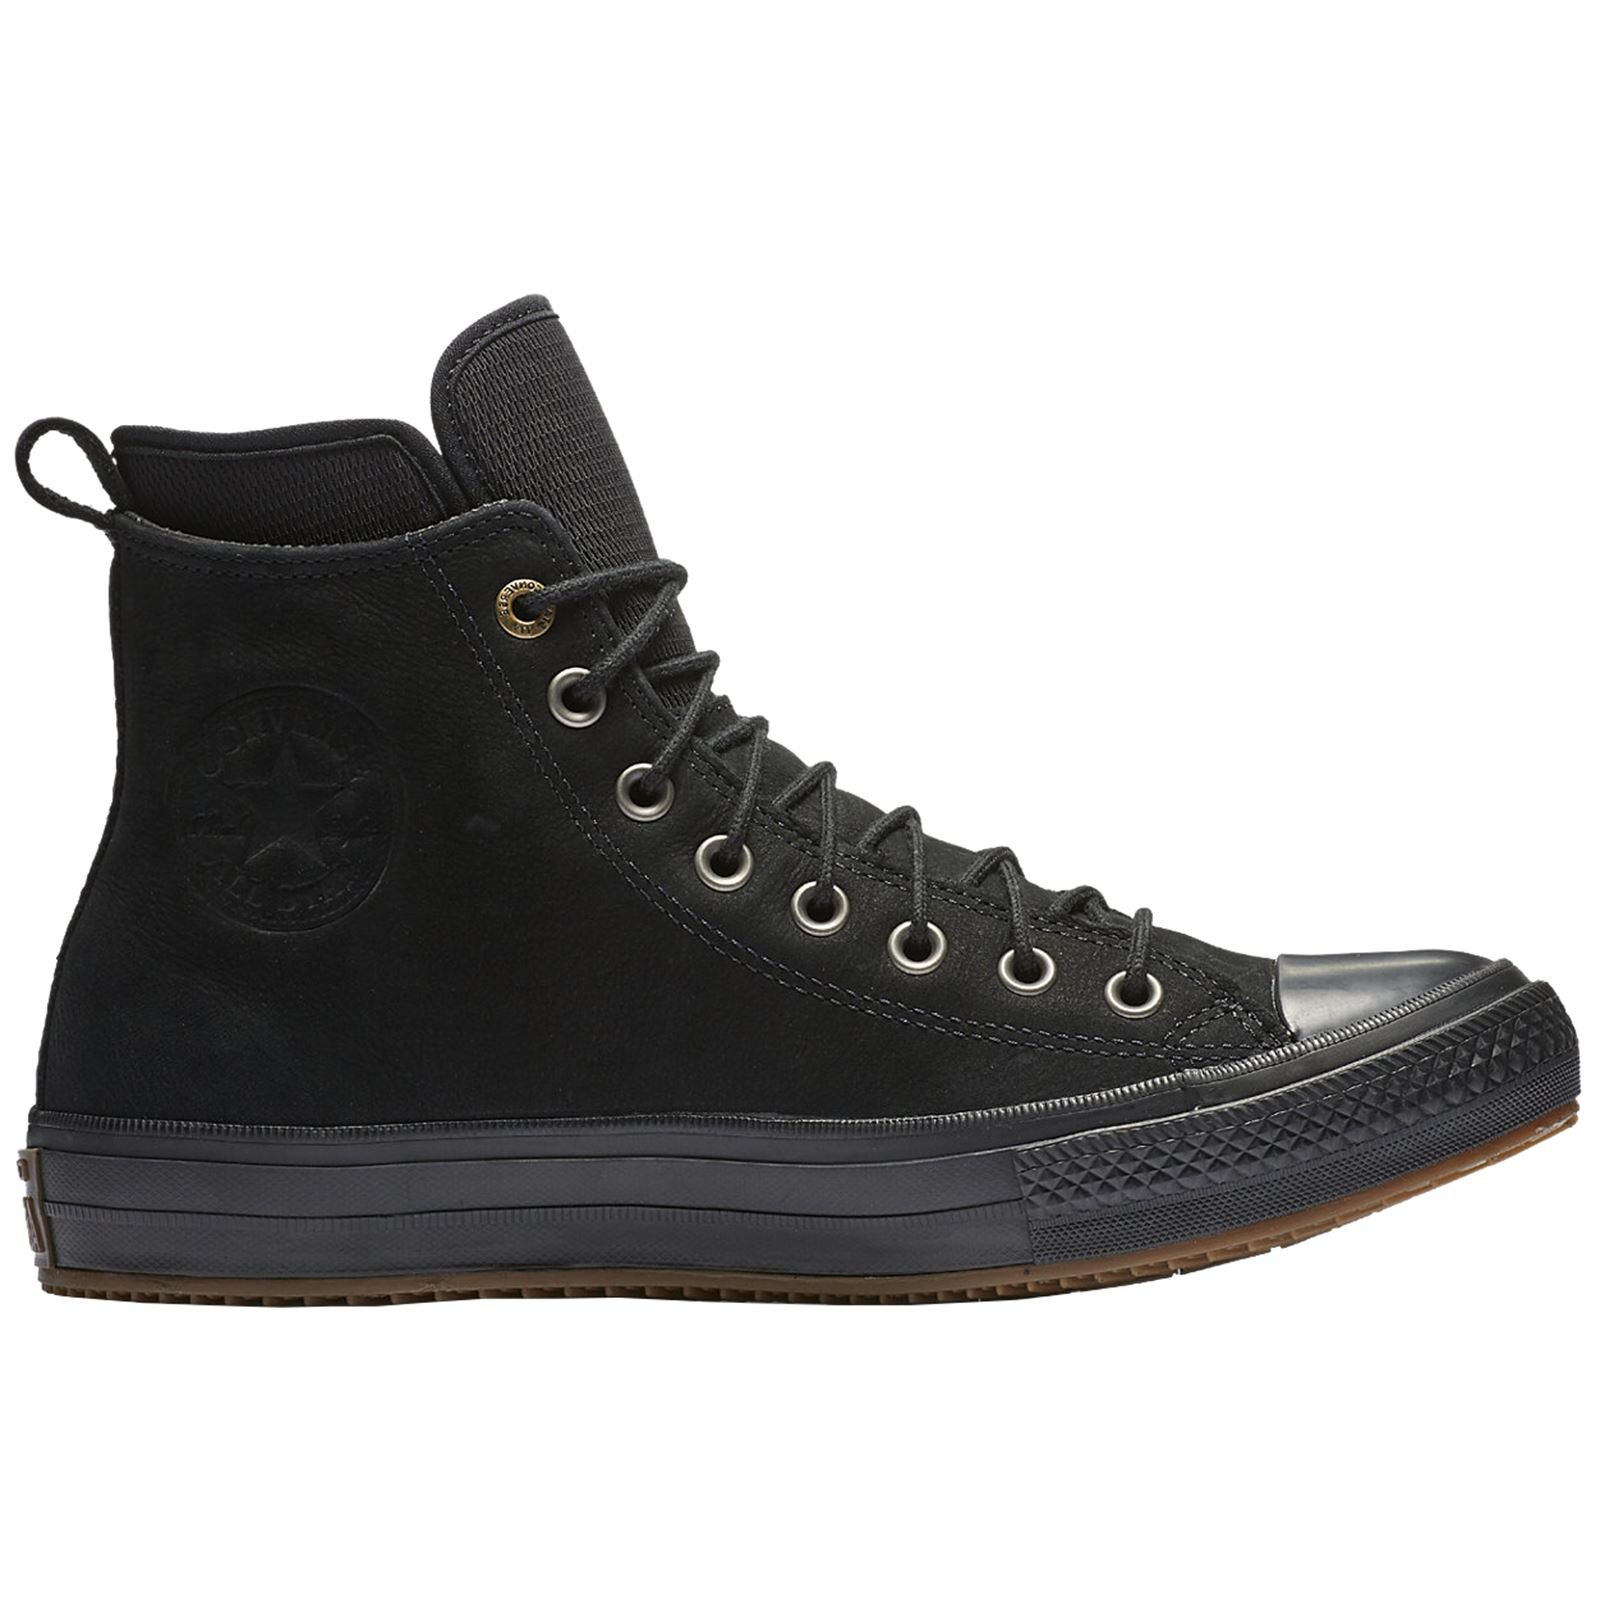 52d7edacb864 Galleon - Converse Womens Chuck Taylor All Star Waterproof Boot Hi Black  Nubuck Boots 7 US